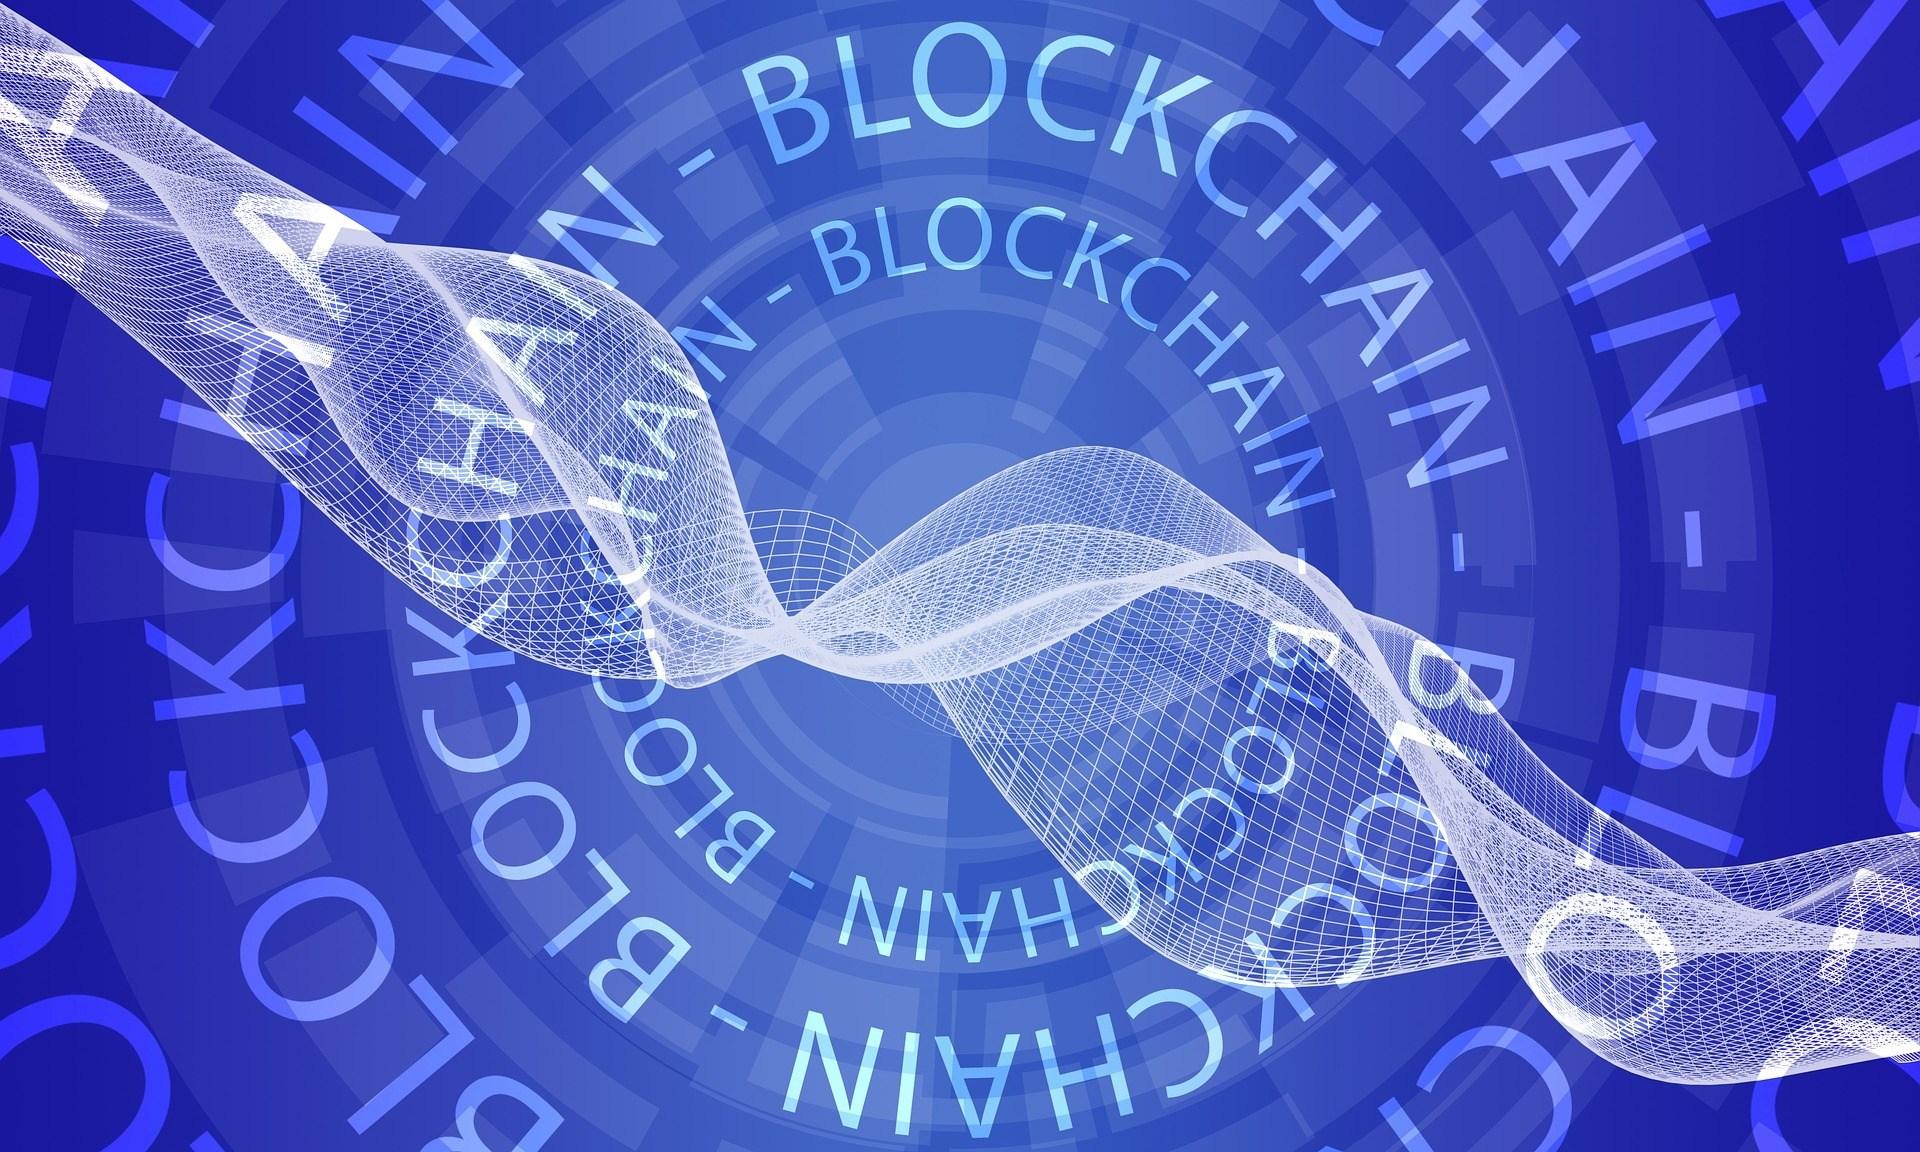 Addressing Security Concerns and Challenges Around Blockchain